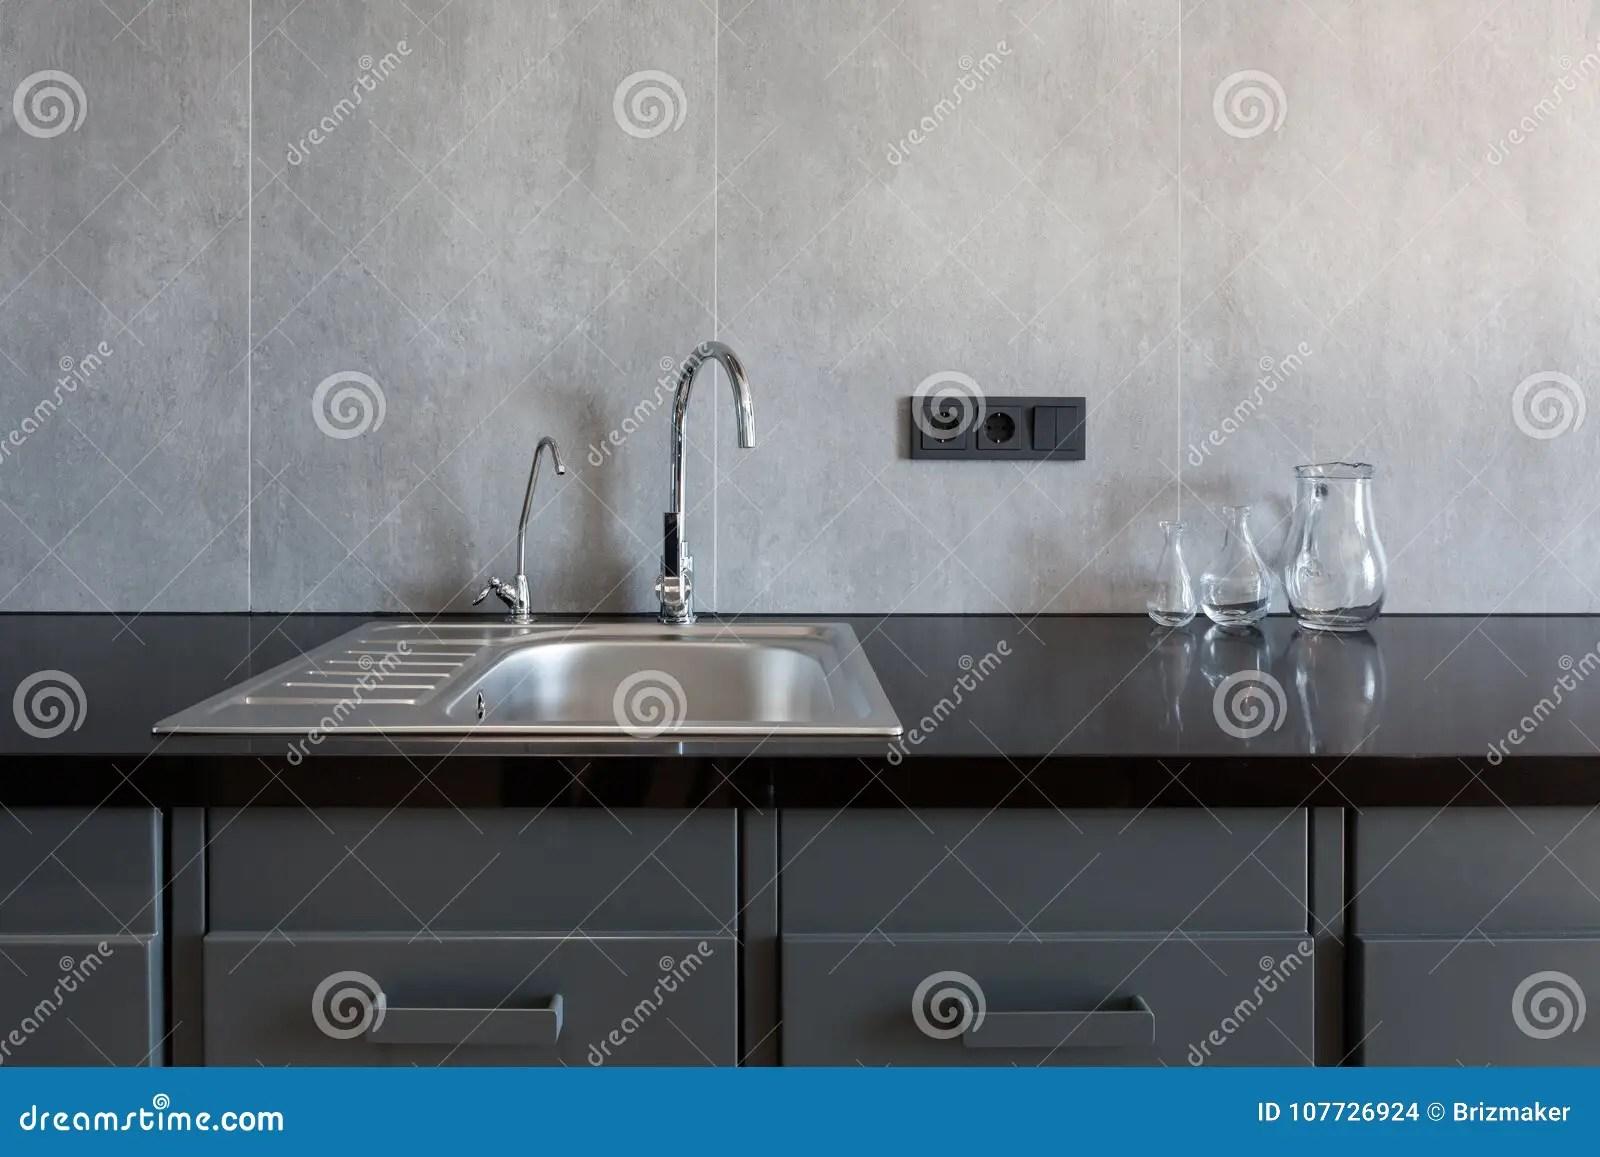 deep kitchen sink farmhouse cabinet hardware 一个长方形设计师厨房水槽的细节与镀铬物水龙头的库存照片 图片包括有 一个长方形设计师厨房水槽的细节与镀铬物水龙头的